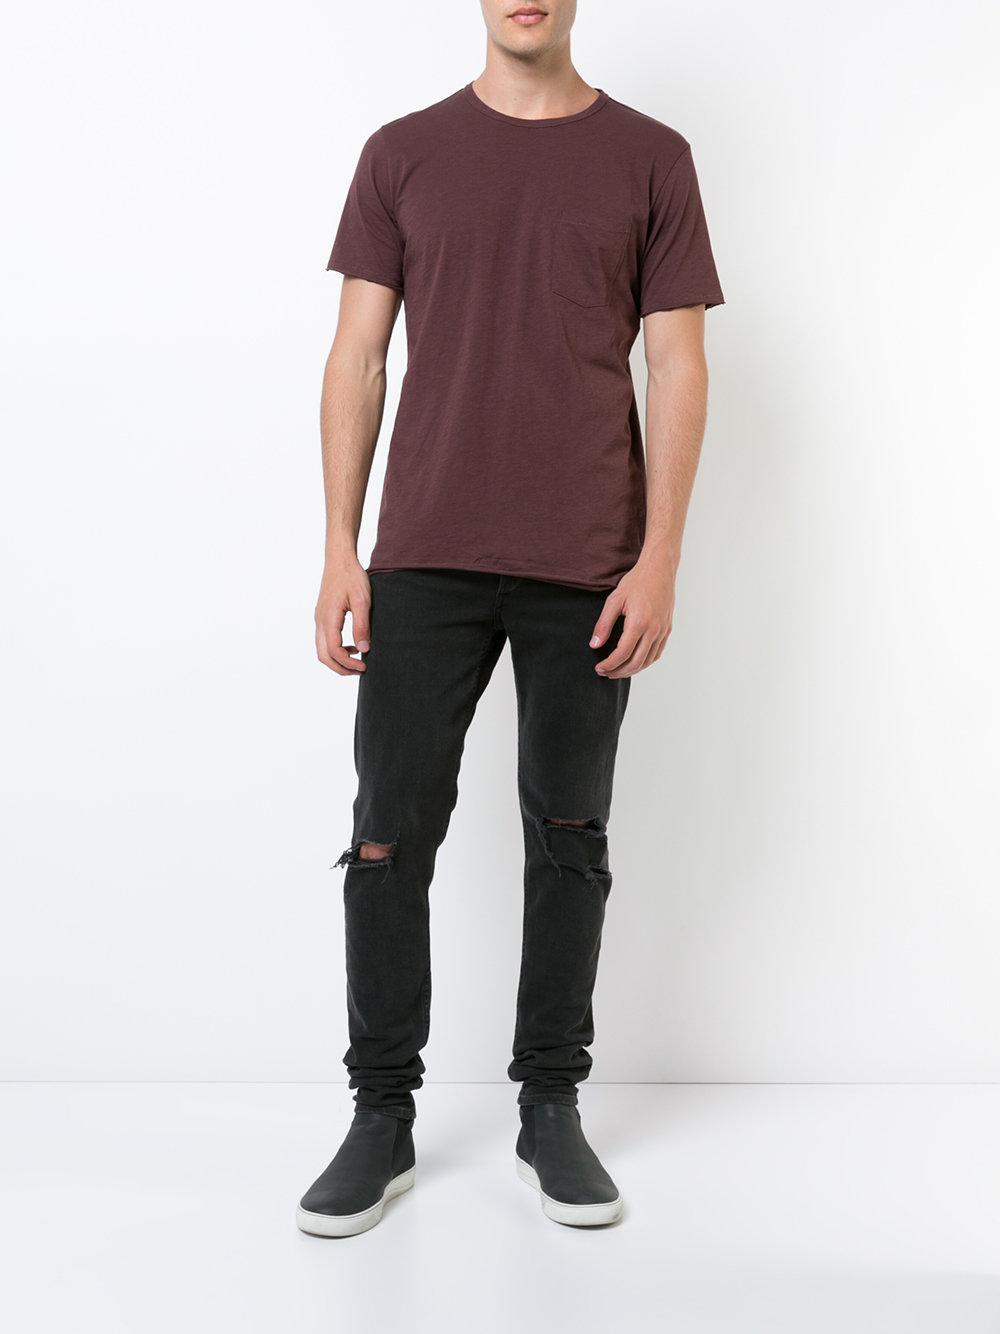 Lyst rag bone raw edge t shirt in purple for men for Rag bone shirt